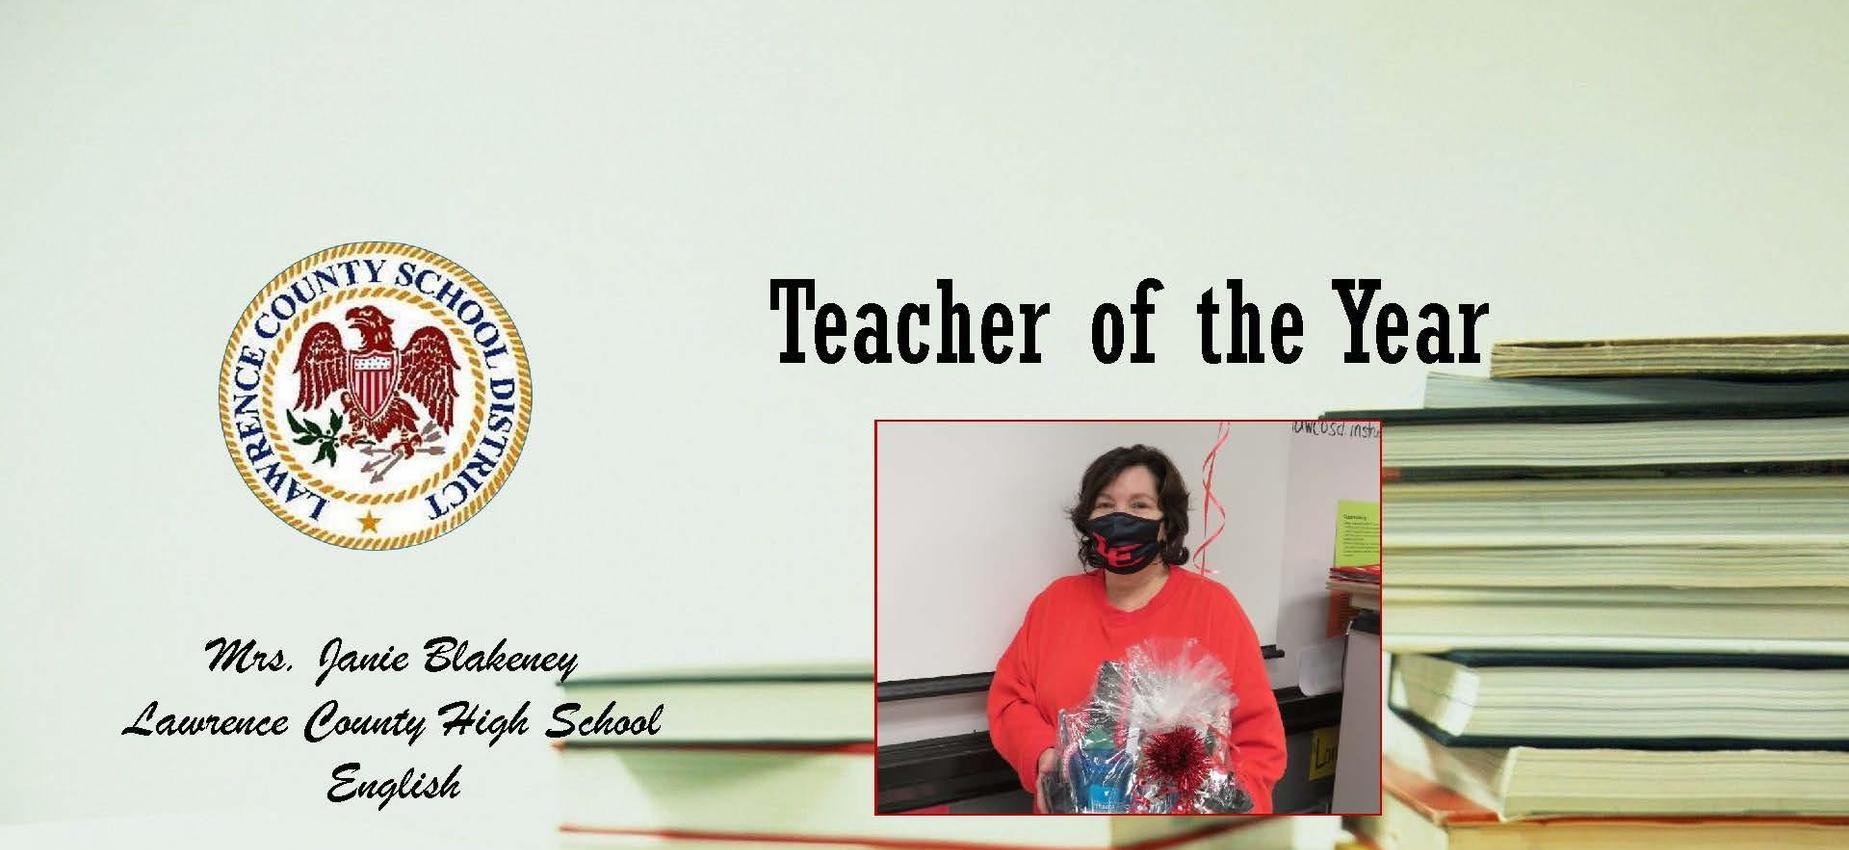 District Teacher of the Year 2020- Mrs. Janie Blakeney